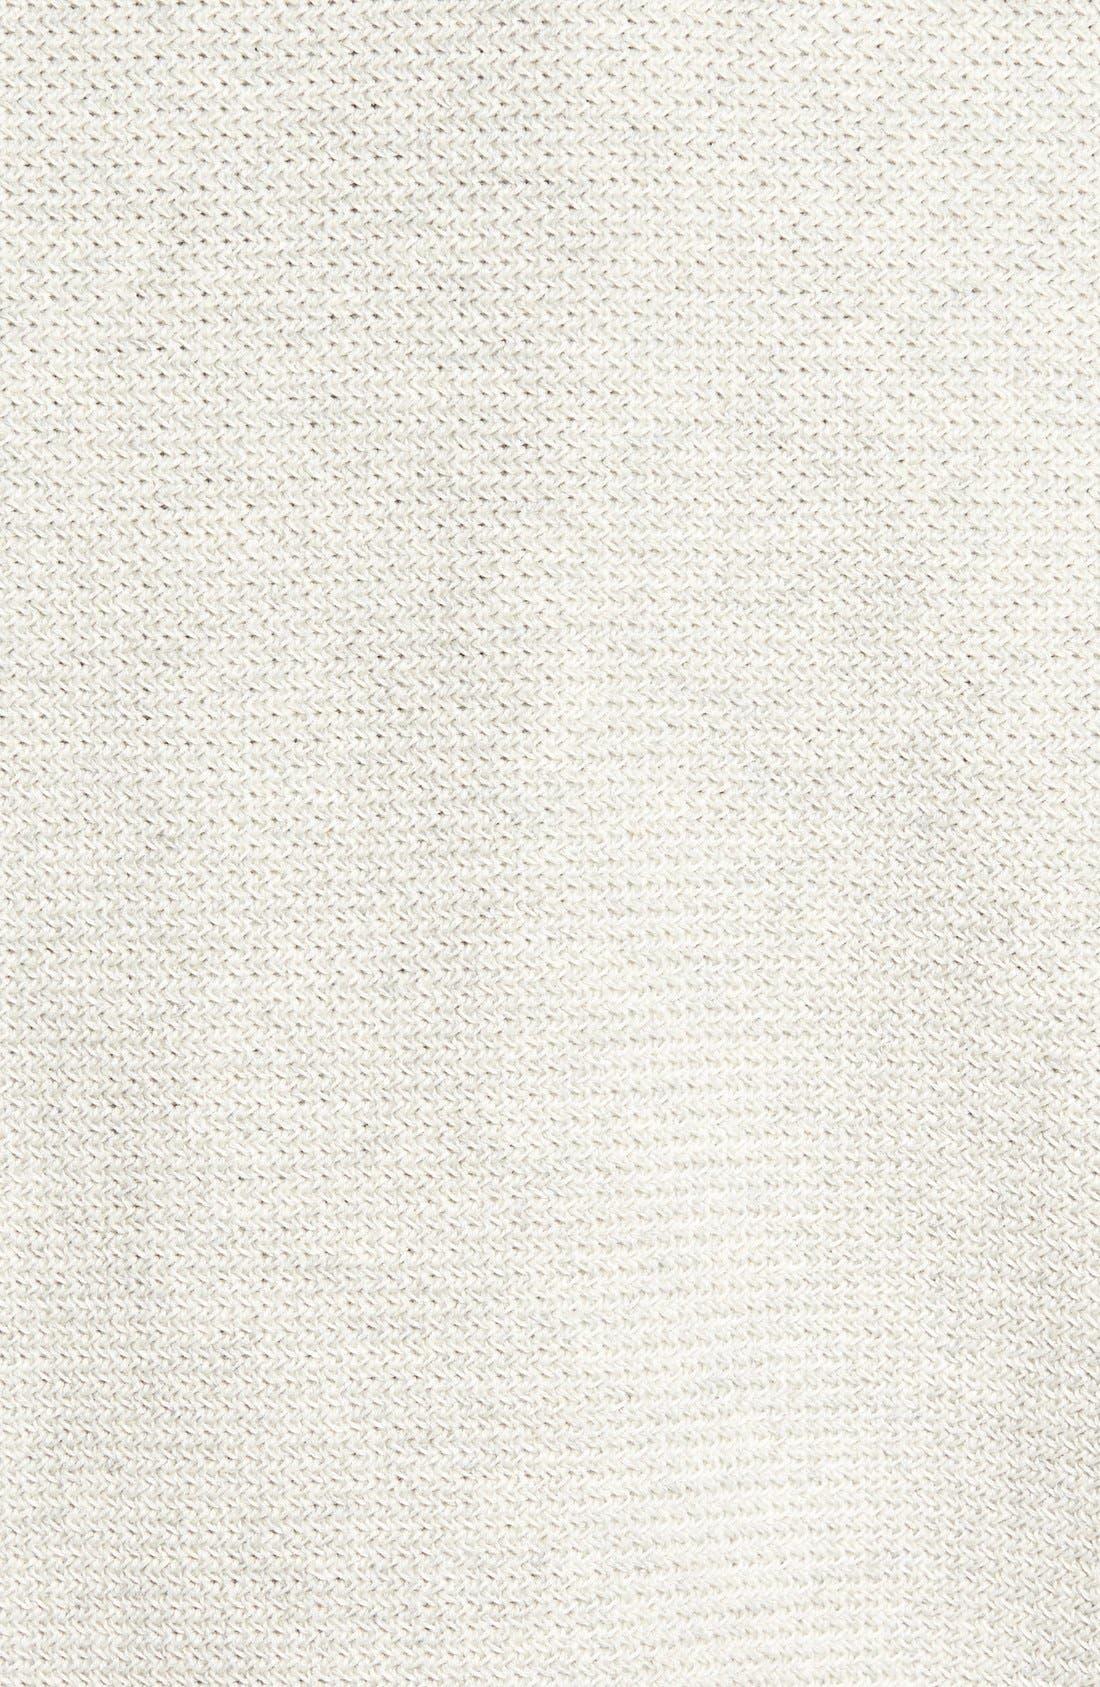 'Benson' Quarter Zip Textured Knit Sweater,                             Alternate thumbnail 5, color,                             Limestone Heather